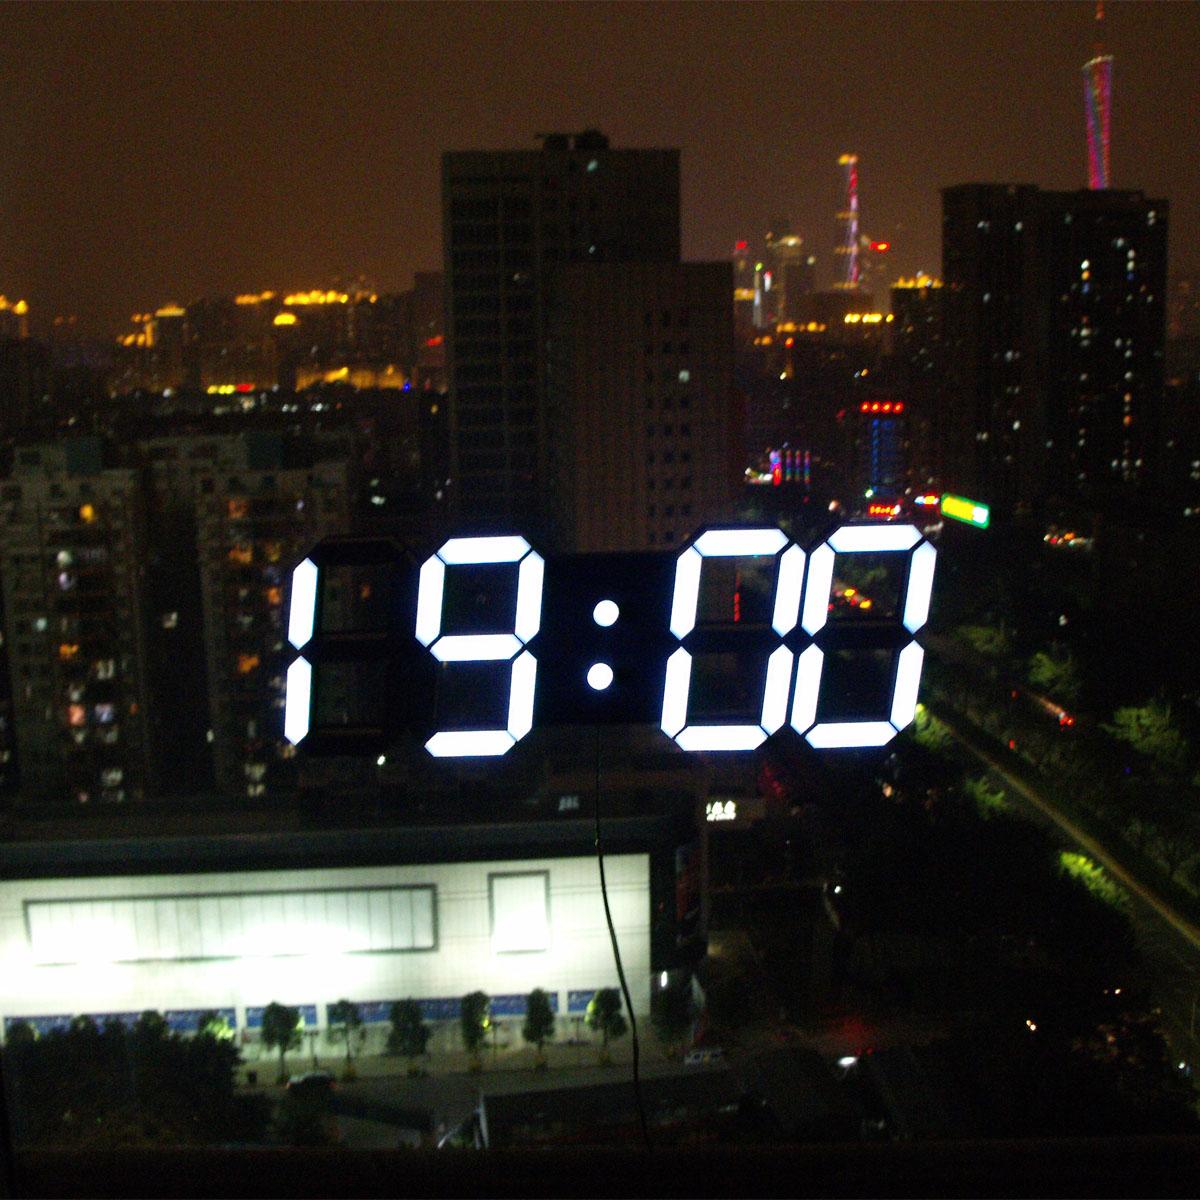 Creative Remote Control Large LED Digital Wall Clock Modern Design Home Decor 3d Decoration Big Decorative Watch White / Black(China (Mainland))